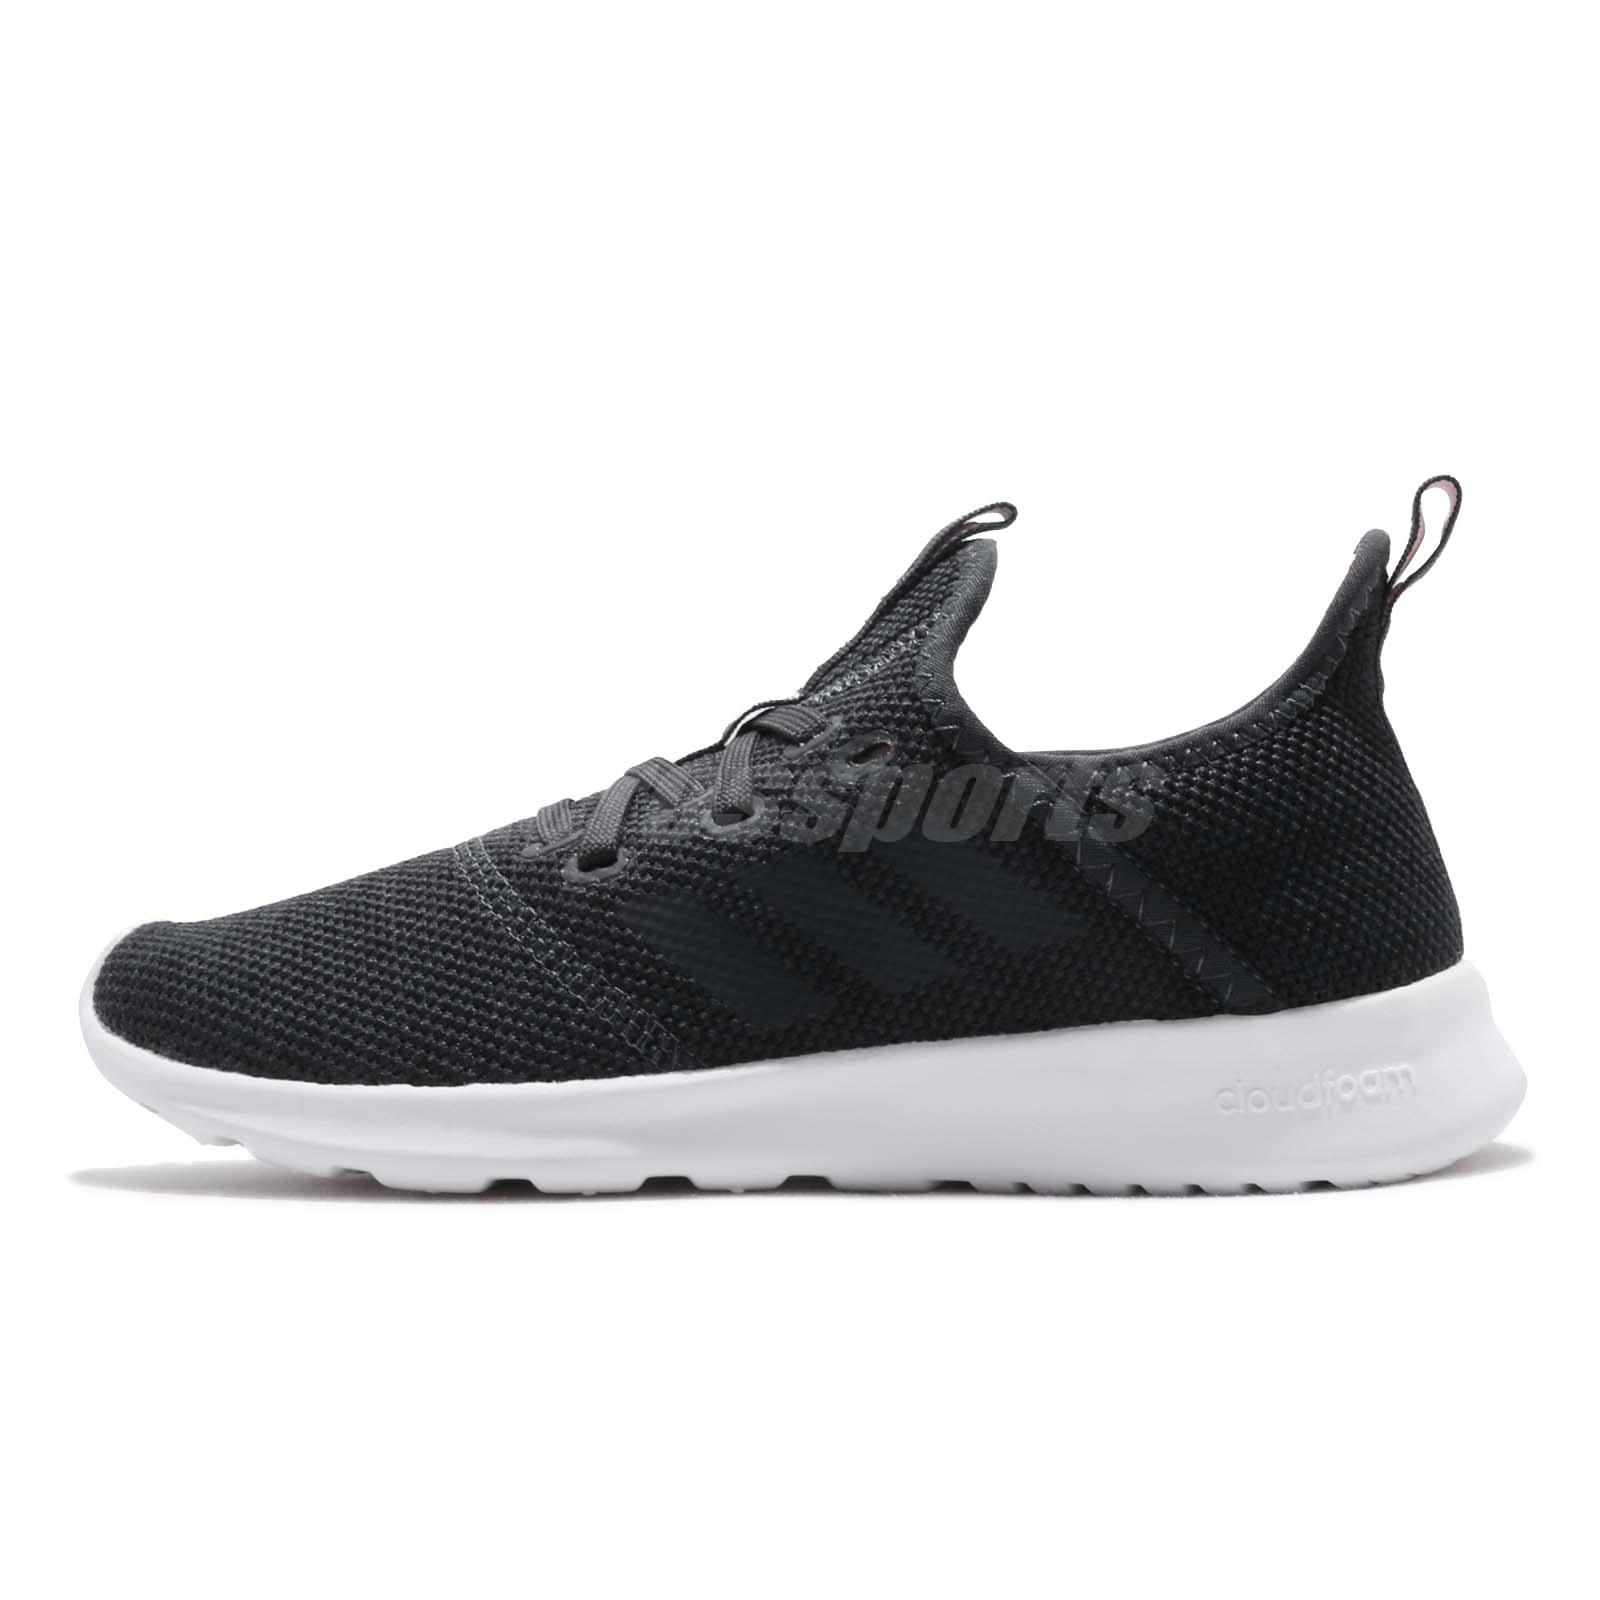 adidas Cloudfoam Pure Carbon Haze Coral Women Running Shoes Sneakers DB1165 6e9d41723